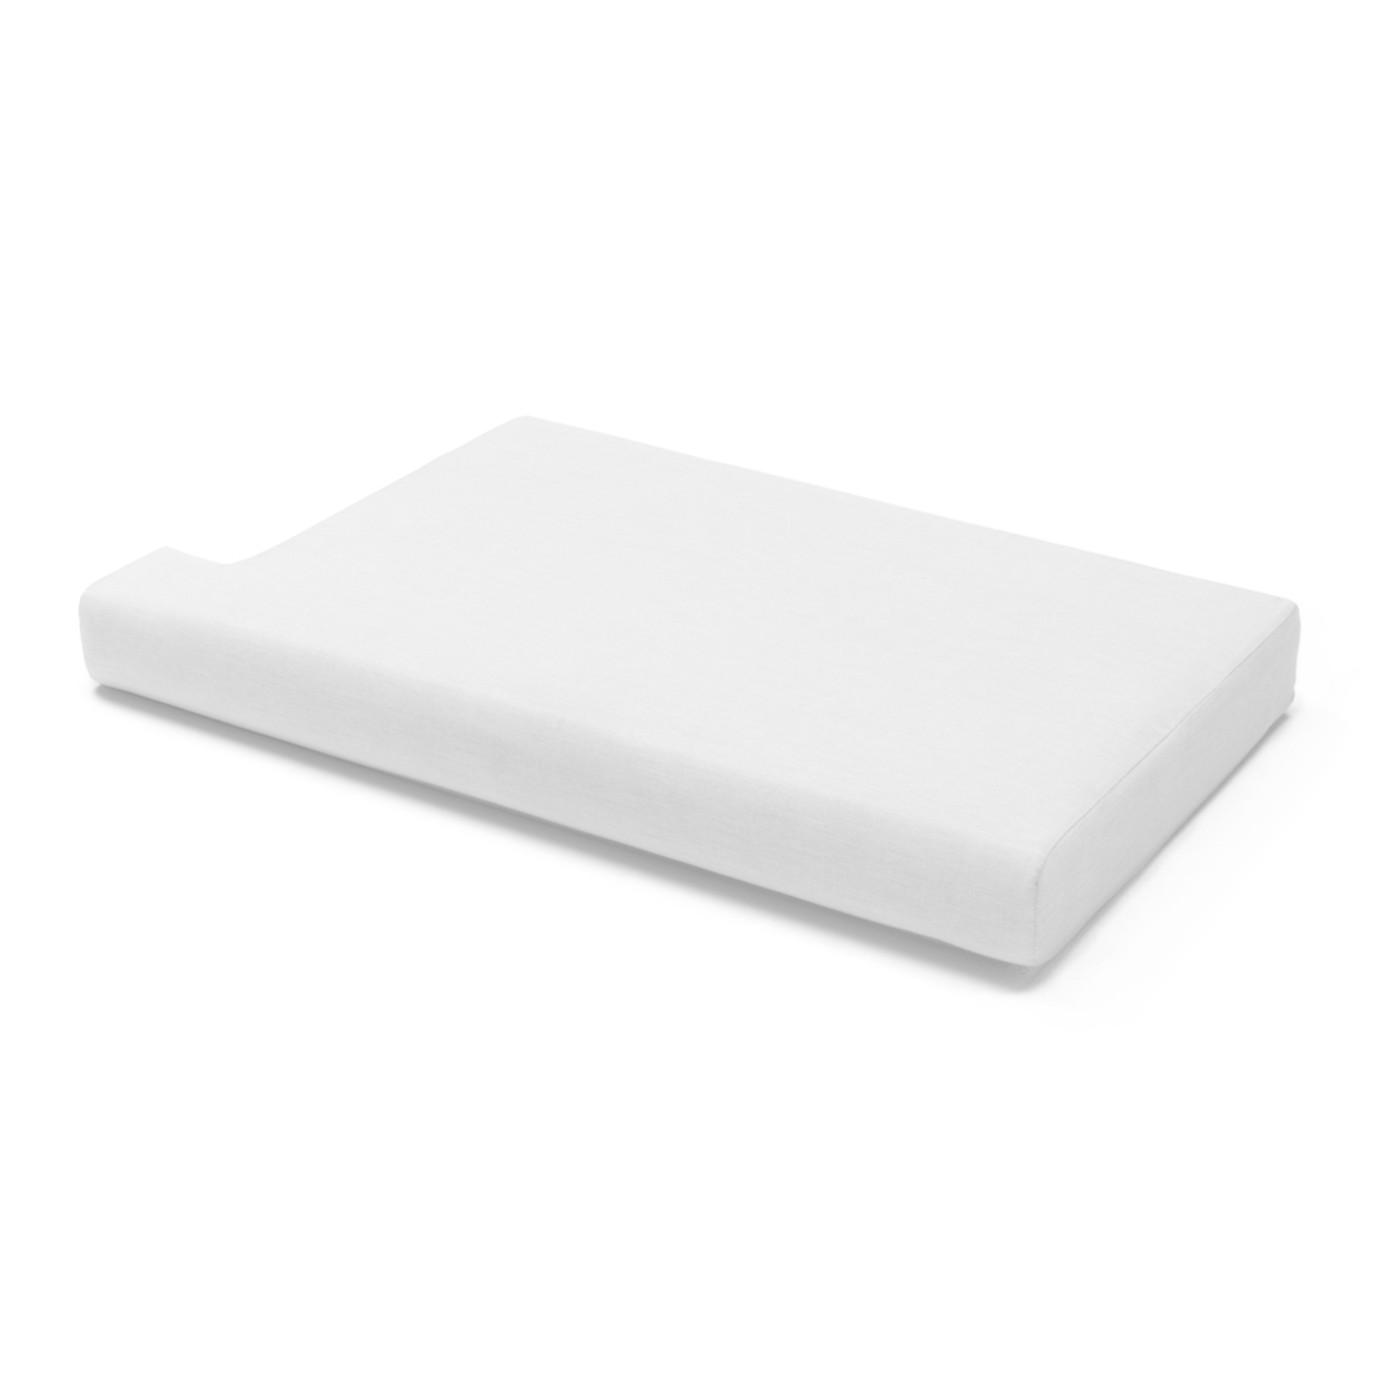 Portofino Sling 96in Sofa Right Base Cushion - Space Gray